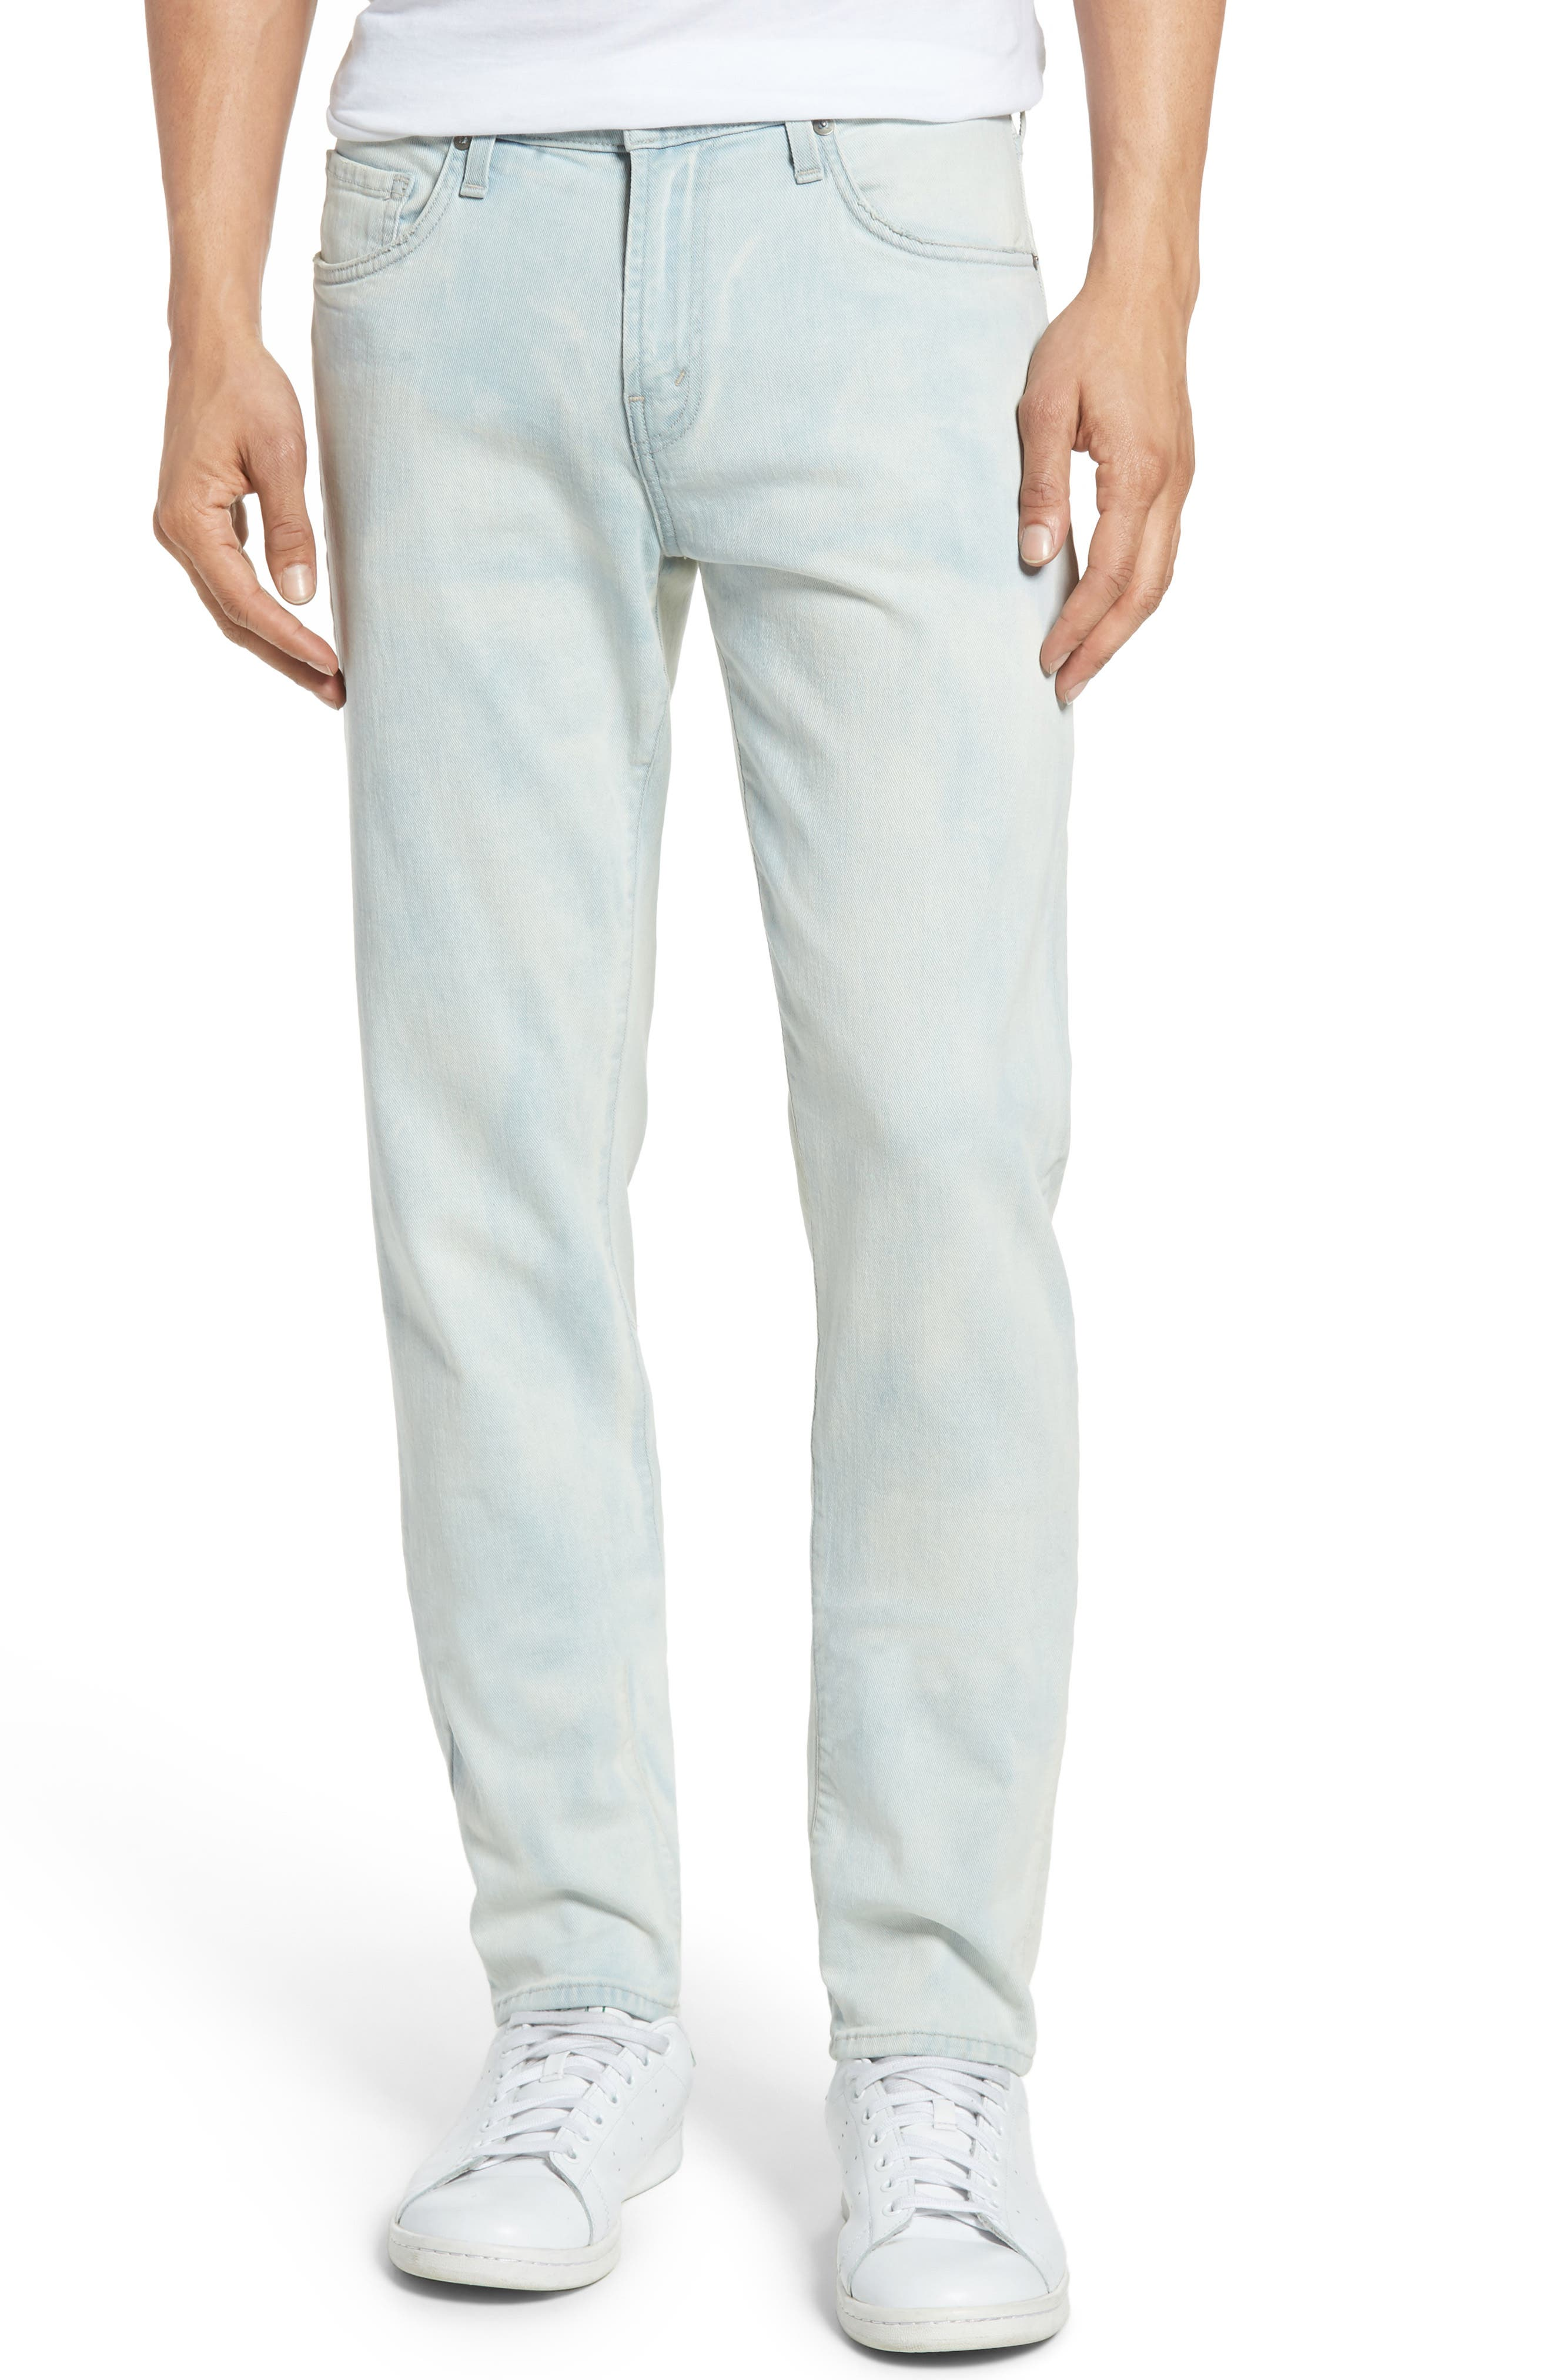 Tyler Slim Fit Jeans,                             Main thumbnail 1, color,                             455